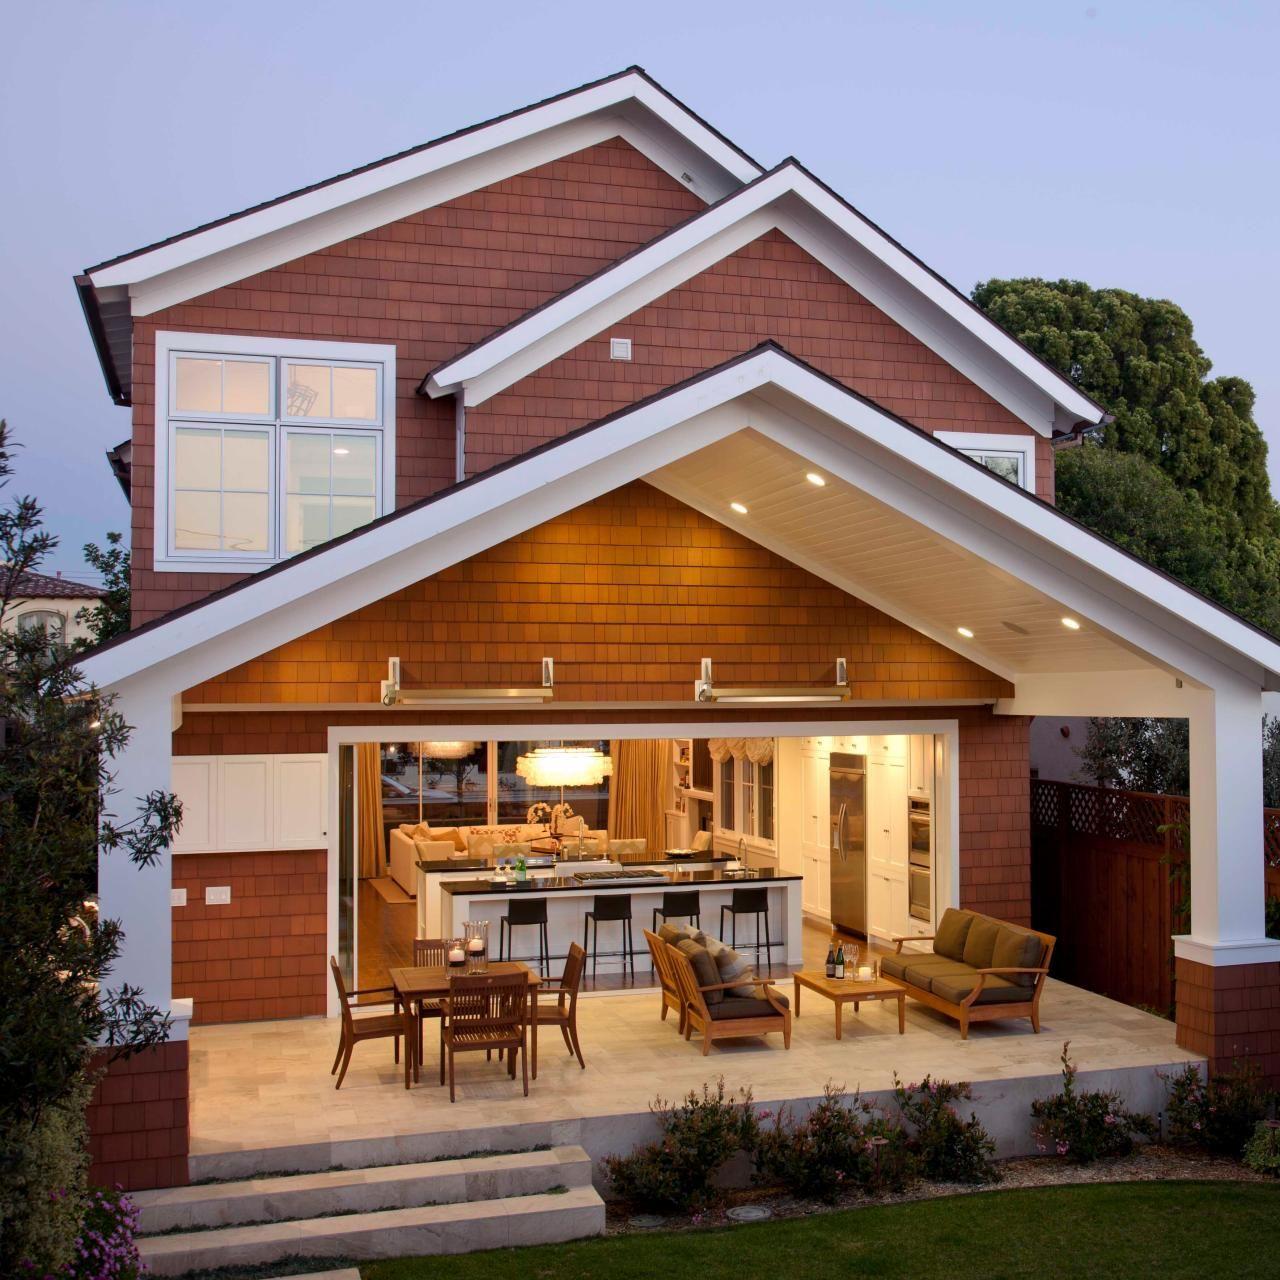 Backyard Deck Ideas Back Porch Designs Porch Design House With Porch Backyard porch ideas for houses